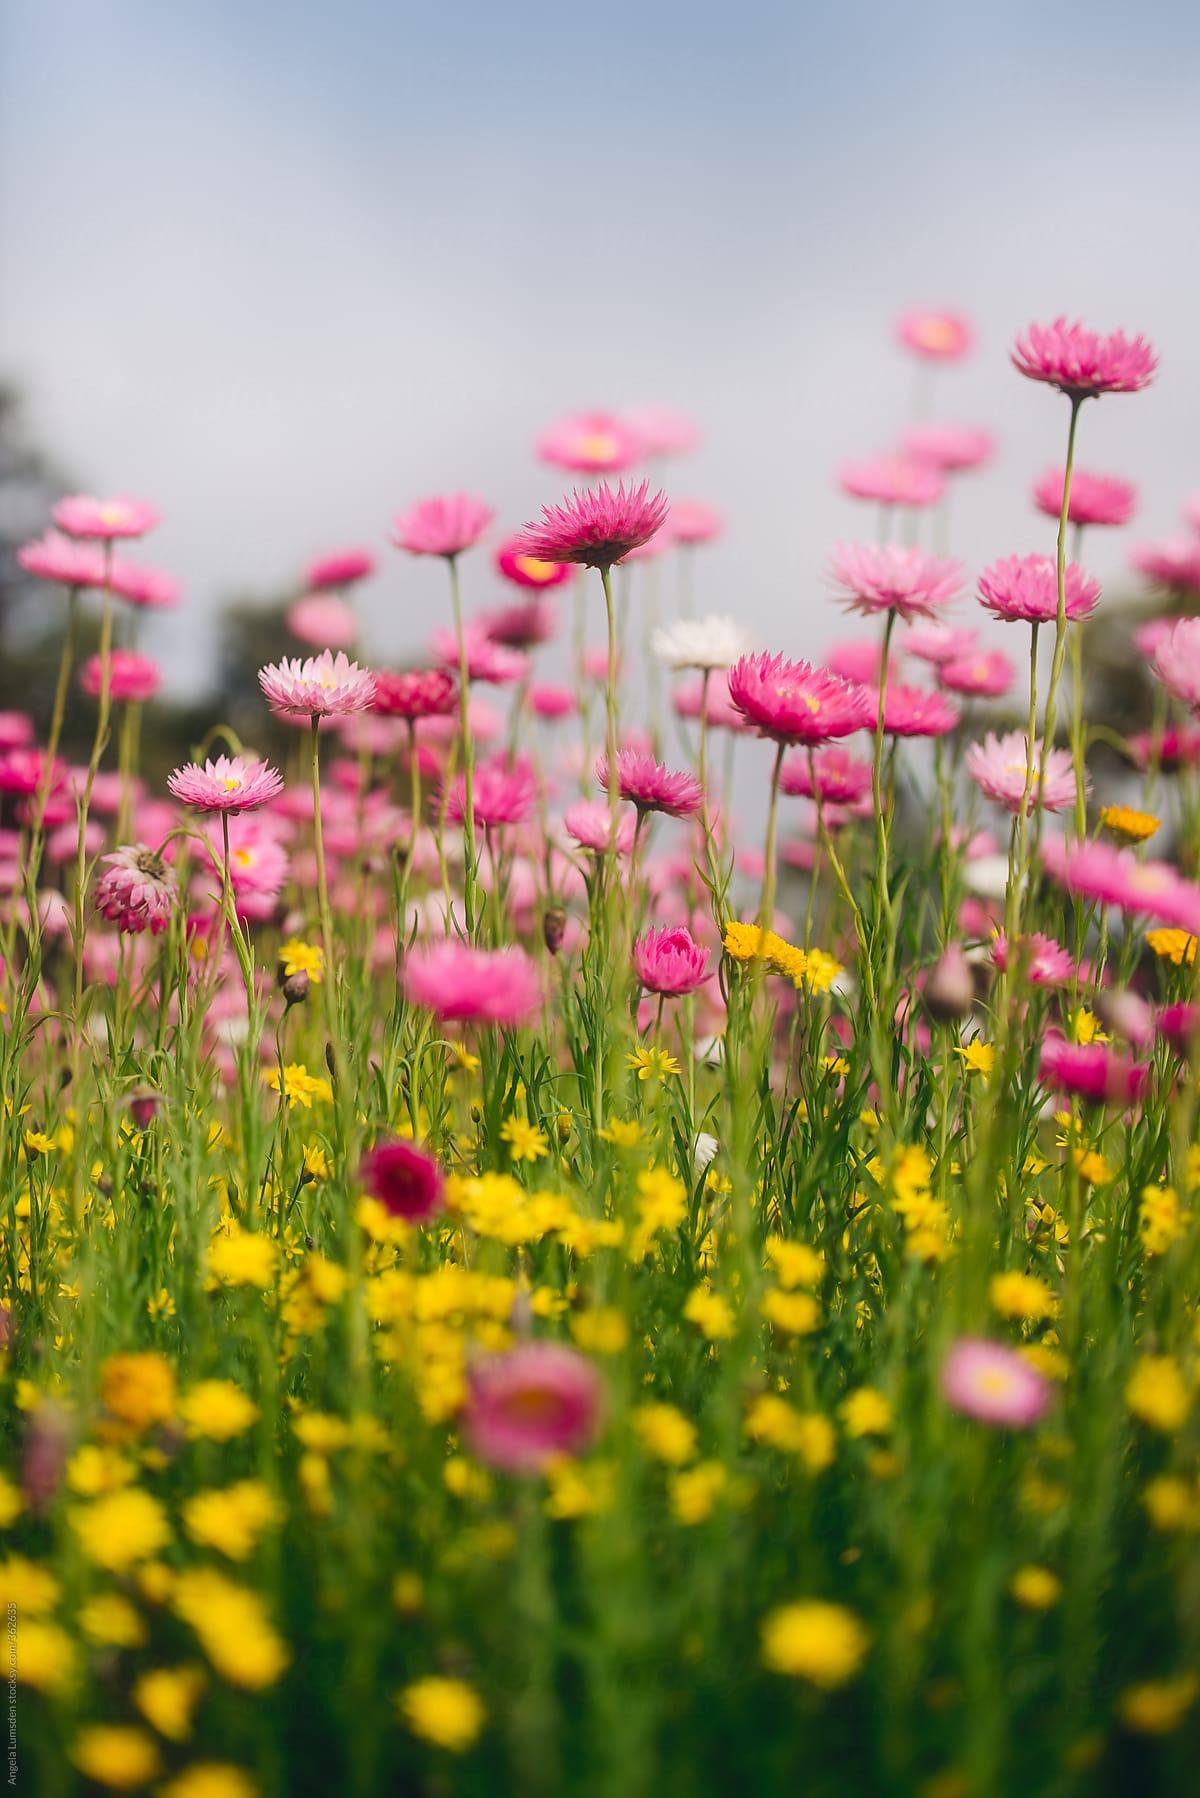 Everlasting Paper Daisy Wildflowers In Spring In Western Australia